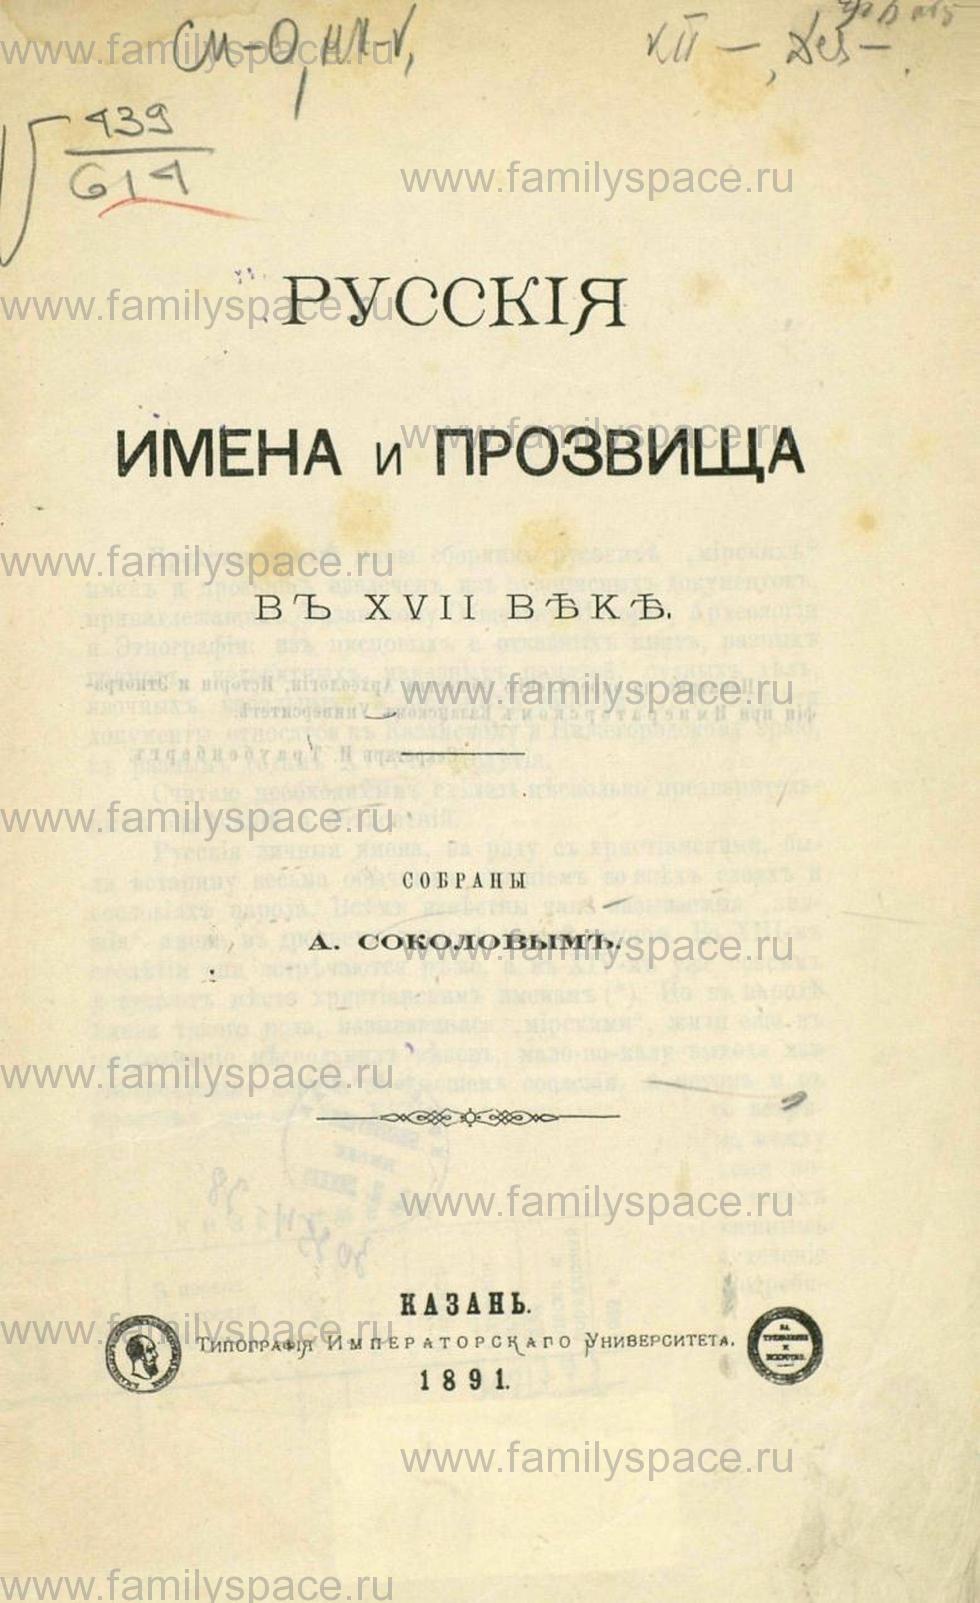 Поиск по фамилии - Русские имена и прозвища в 17 веке, страница 2